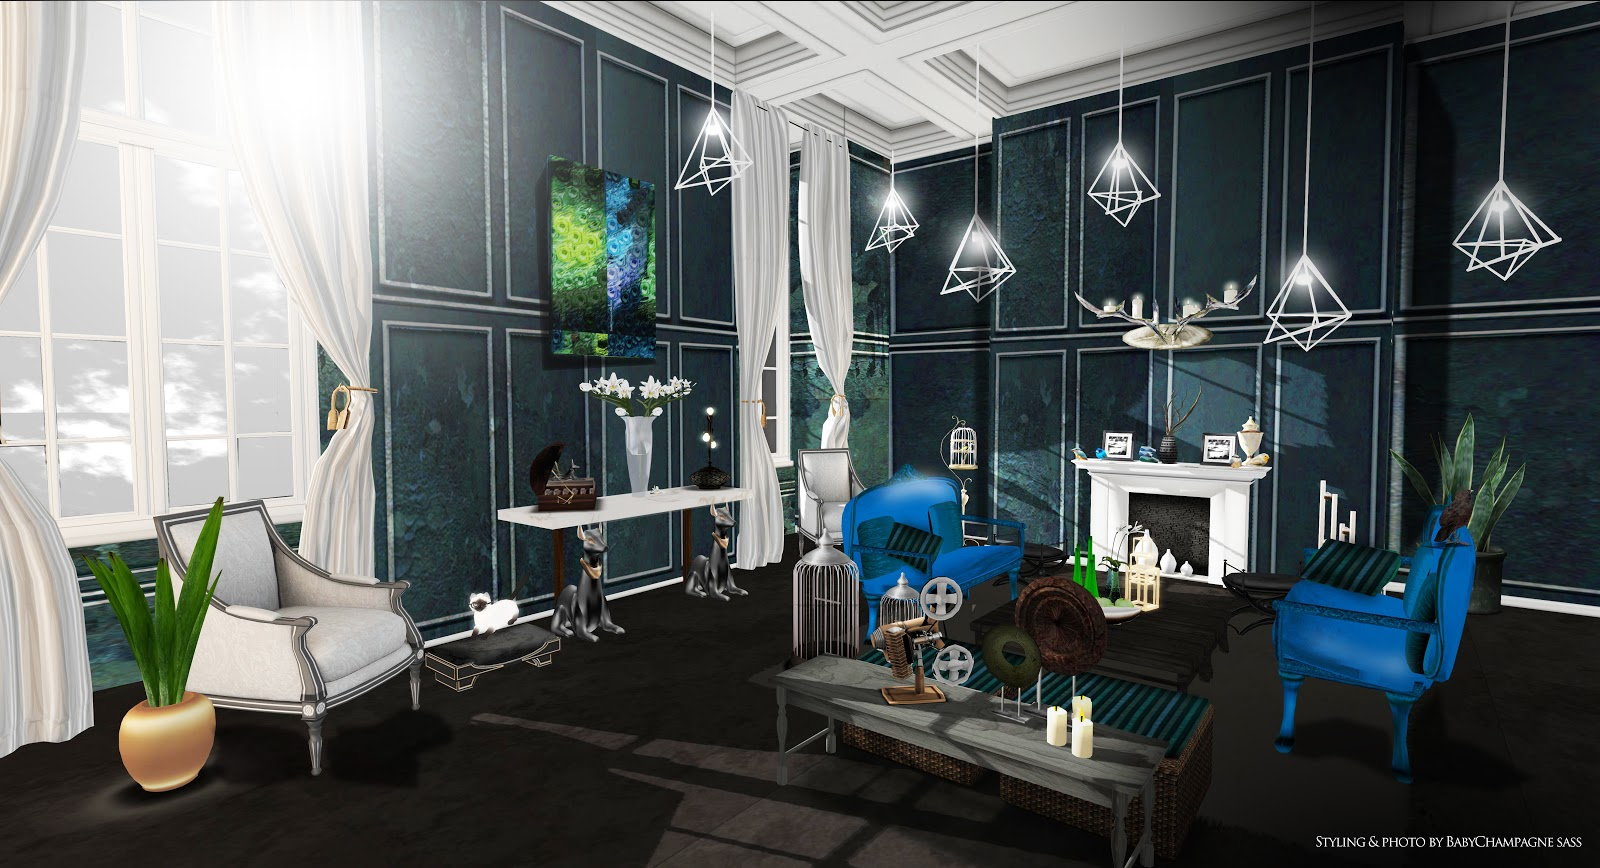 Fashion Themed Room Decor